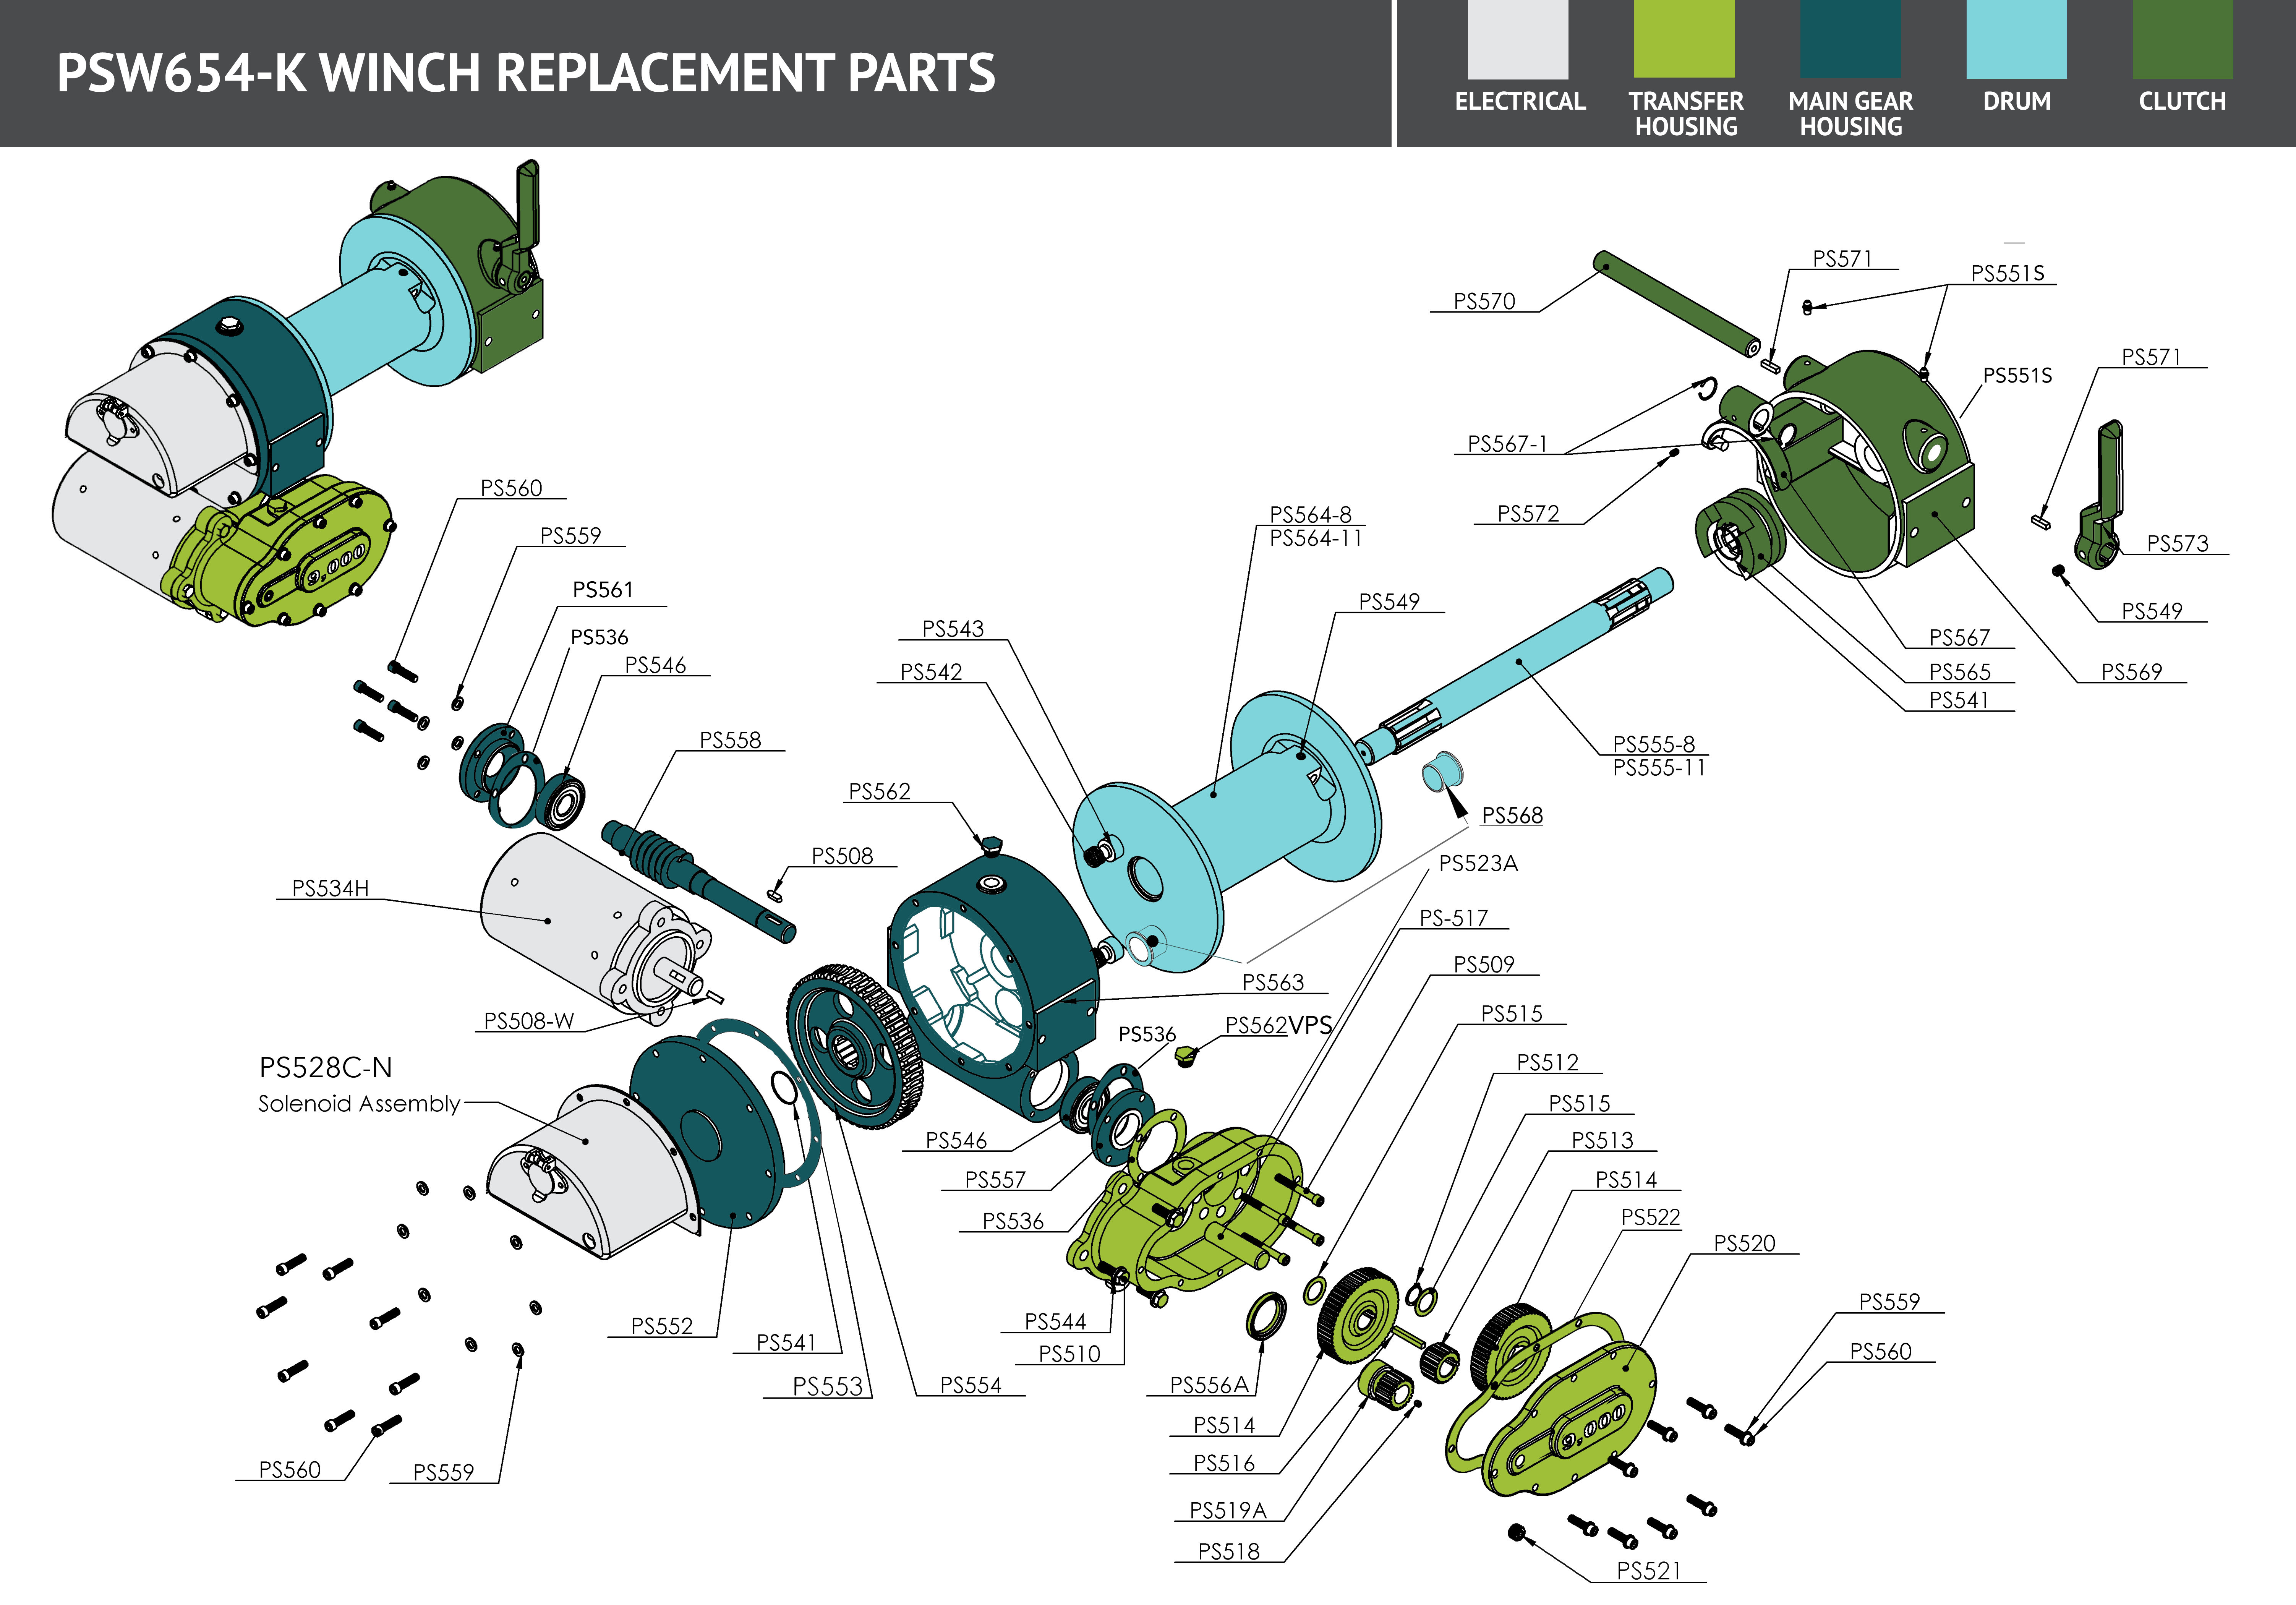 s www piercearrowinc com store?store page=ranch deweze clutch pump deweze wiring diagram #10